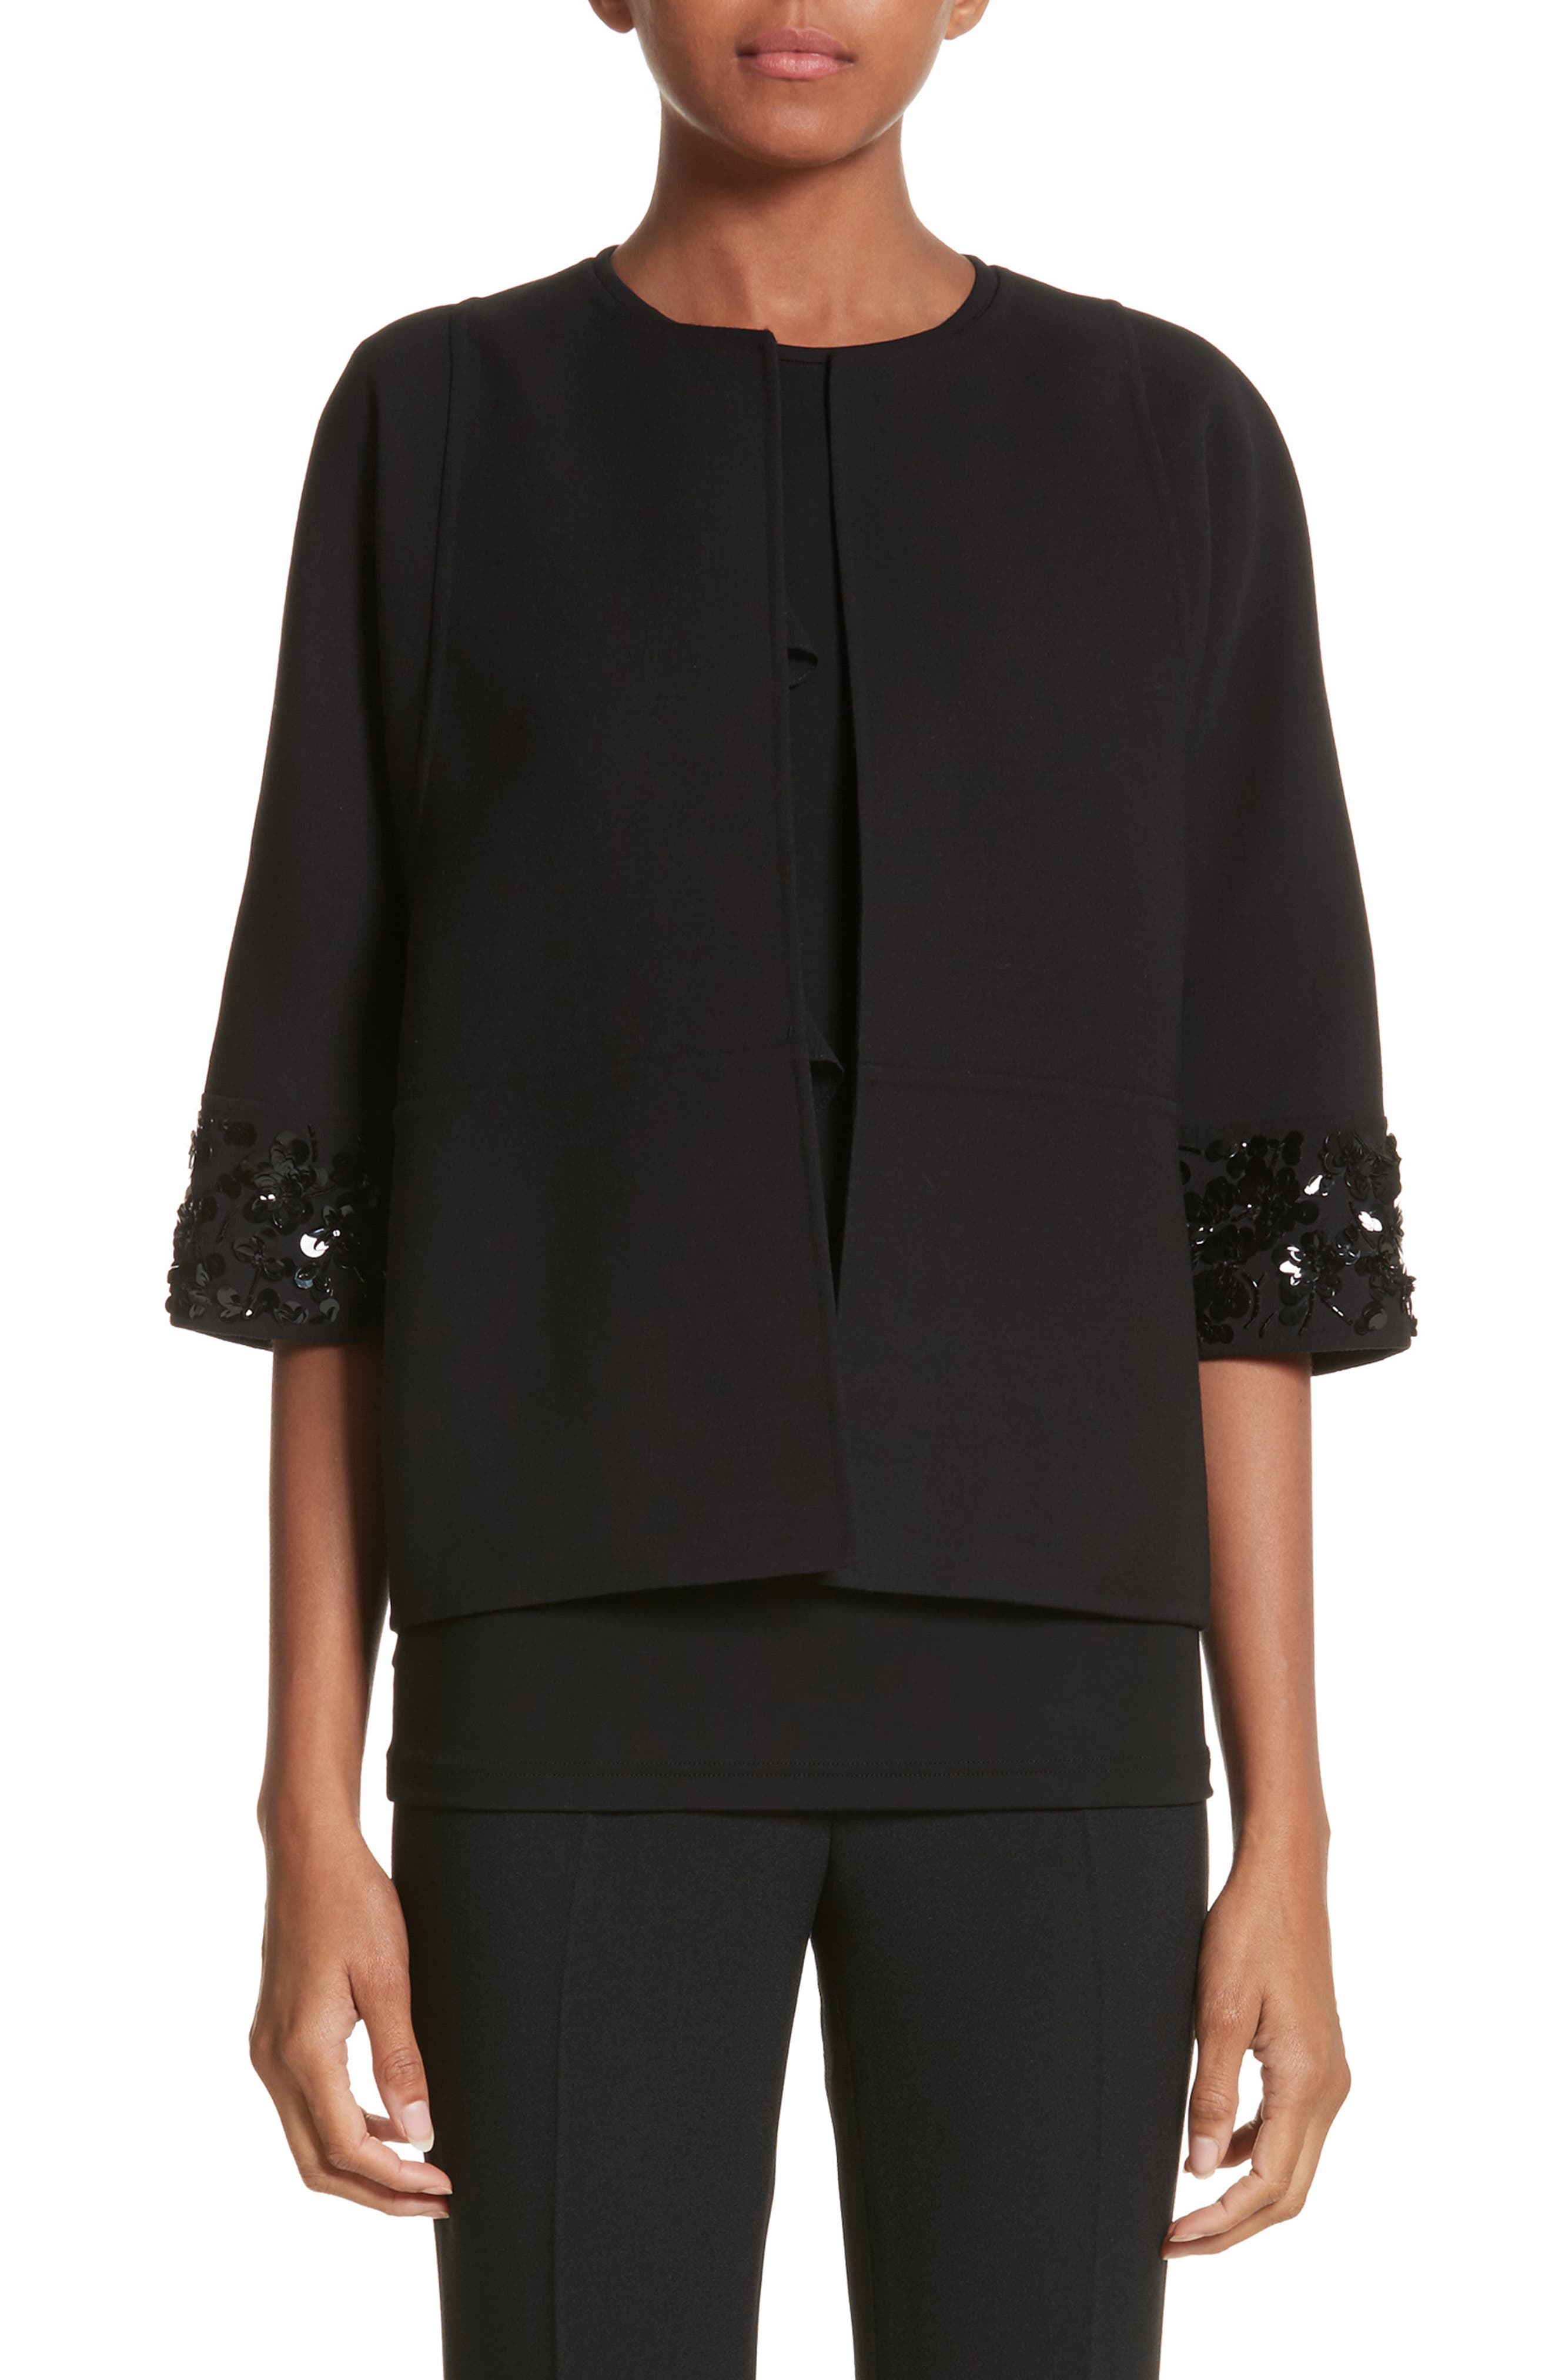 Main Image - Michael Kors Embellished Jacket